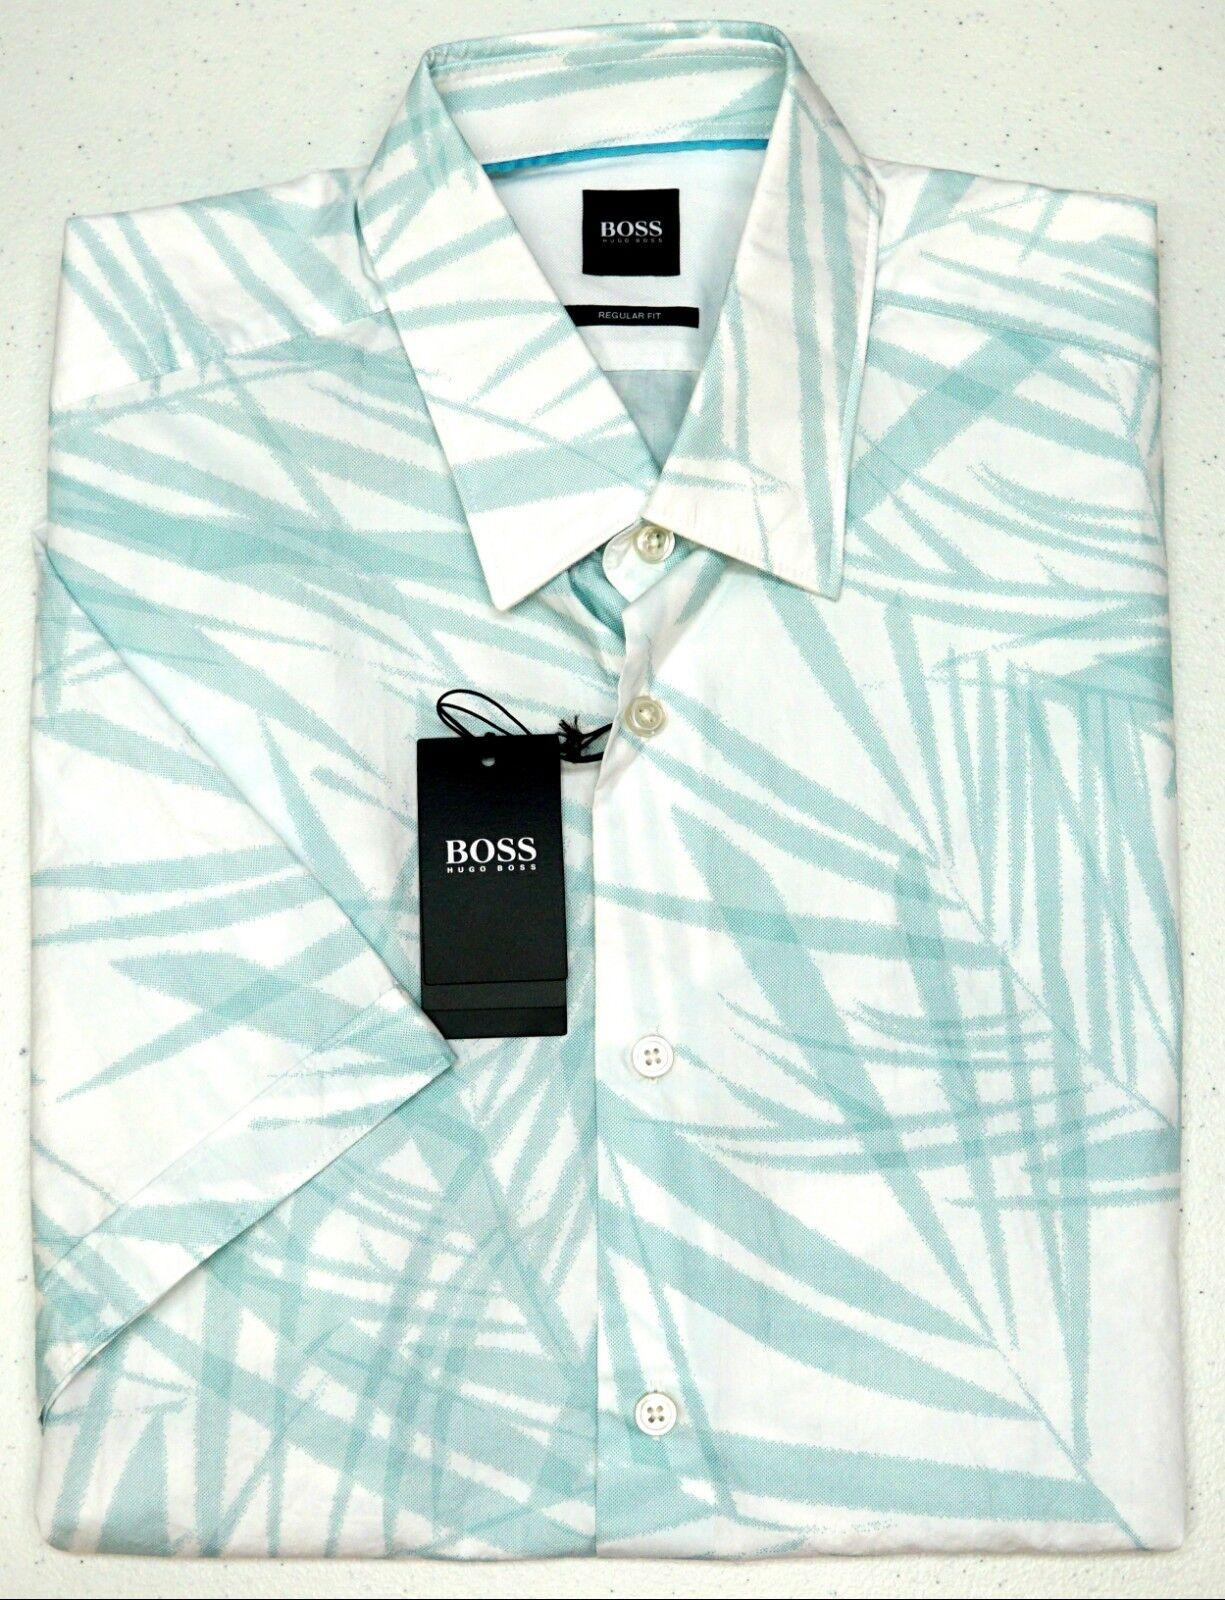 77416737 NWT Hugo Boss White Floral LS Shirt Mens M XL Luka_5F 50385456 Regular Fit